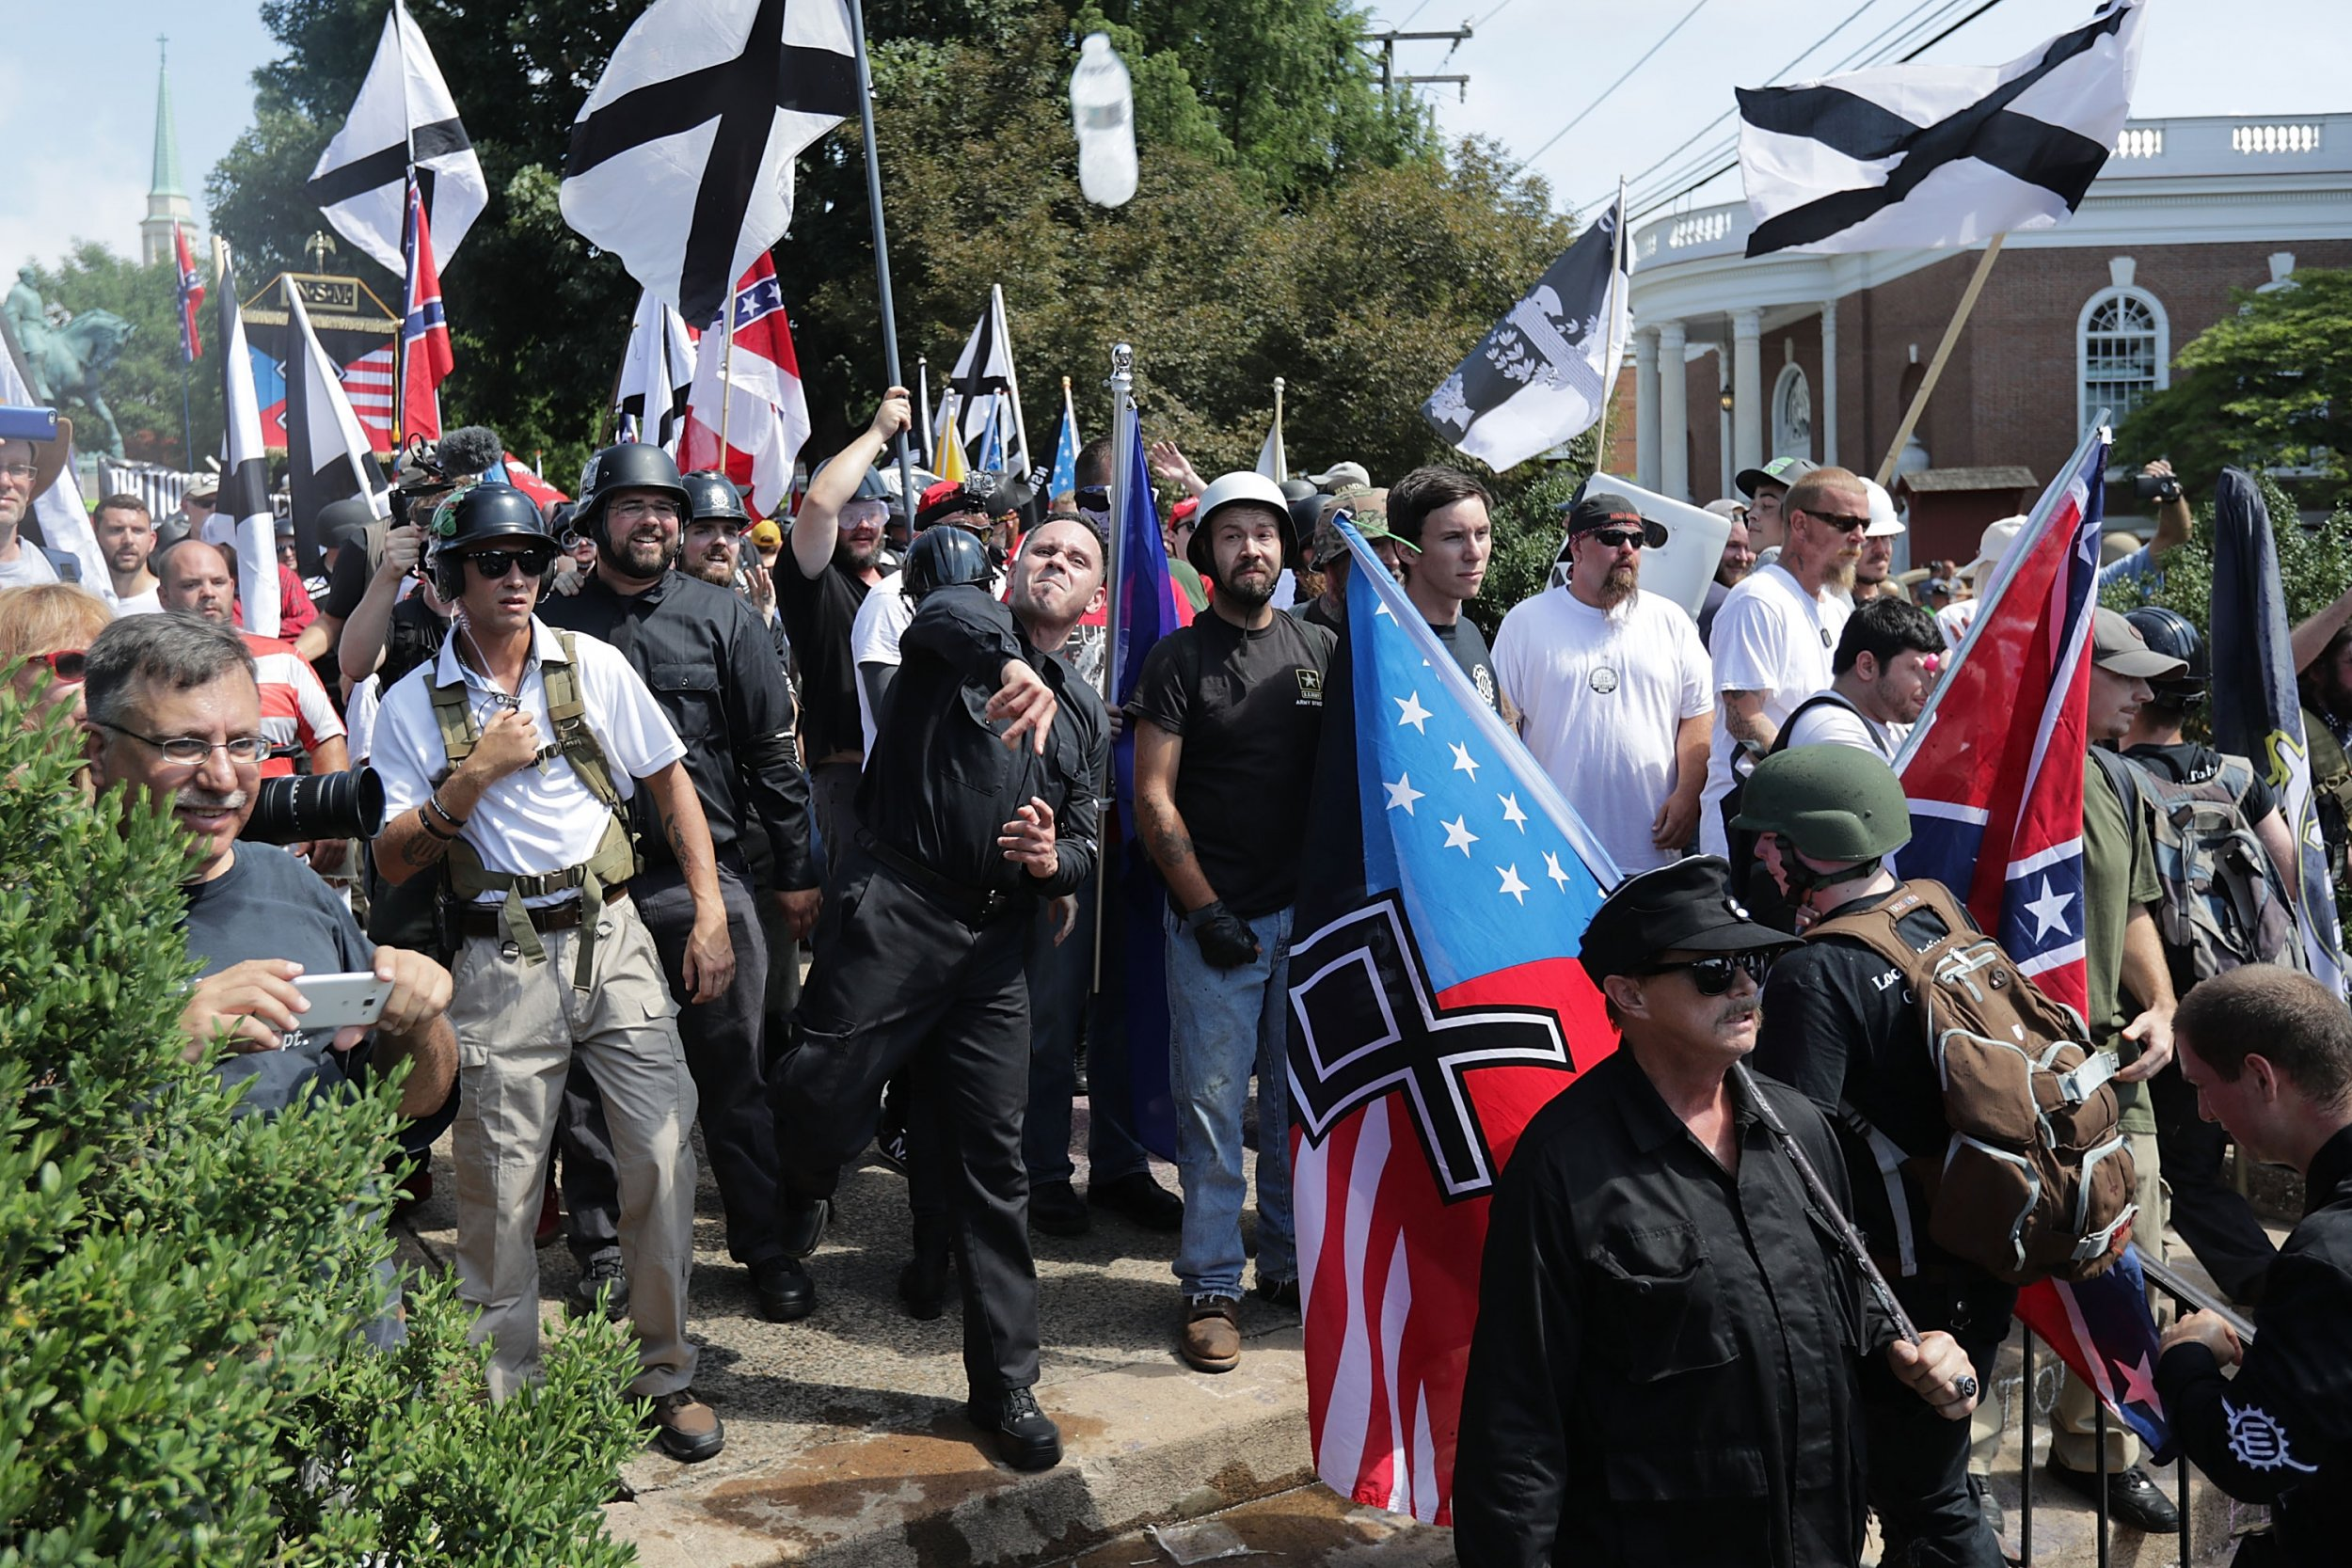 crying nazi hate spreading charlottesville